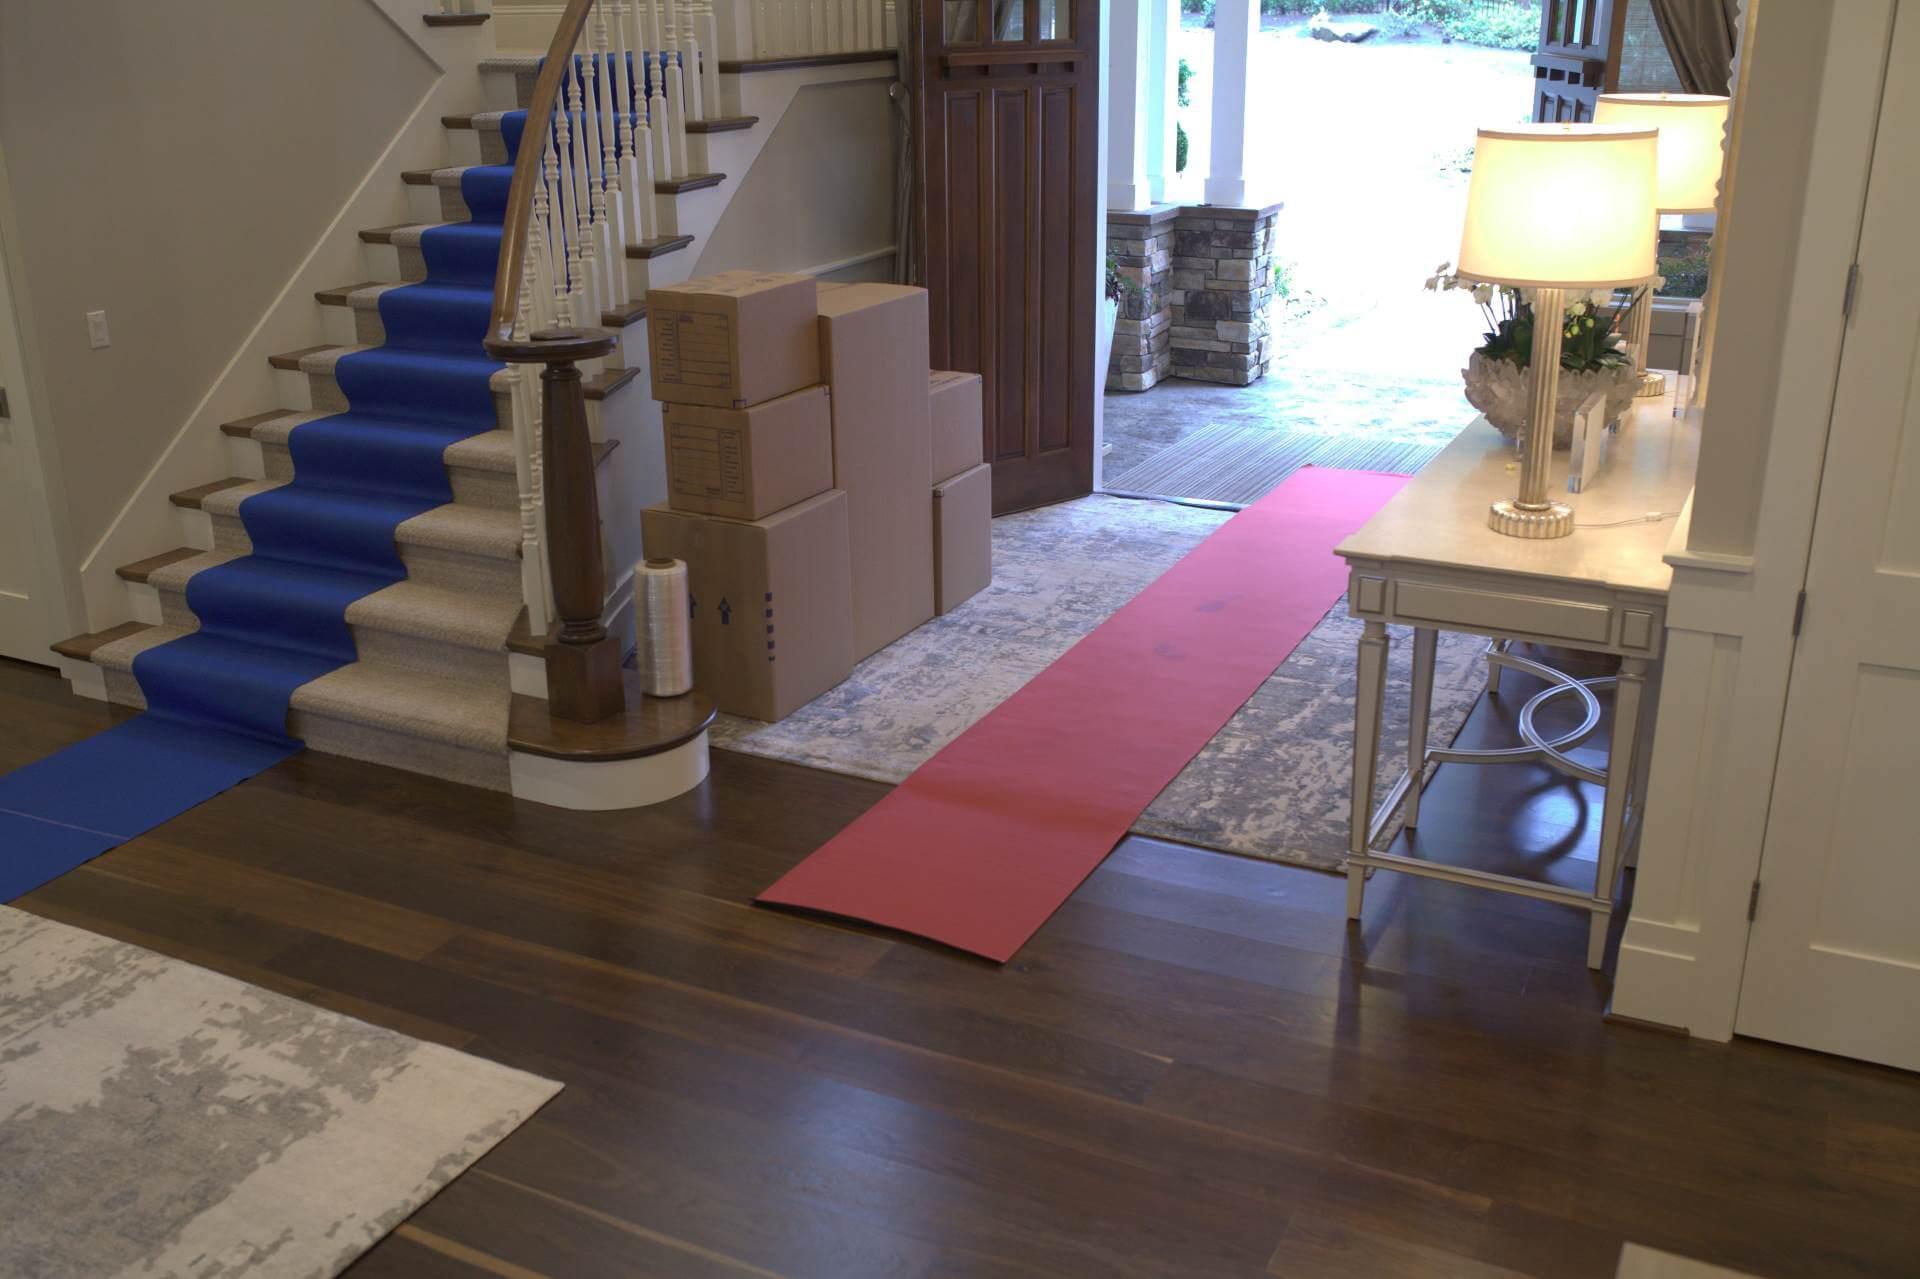 Moving company in Mountlake Terrace